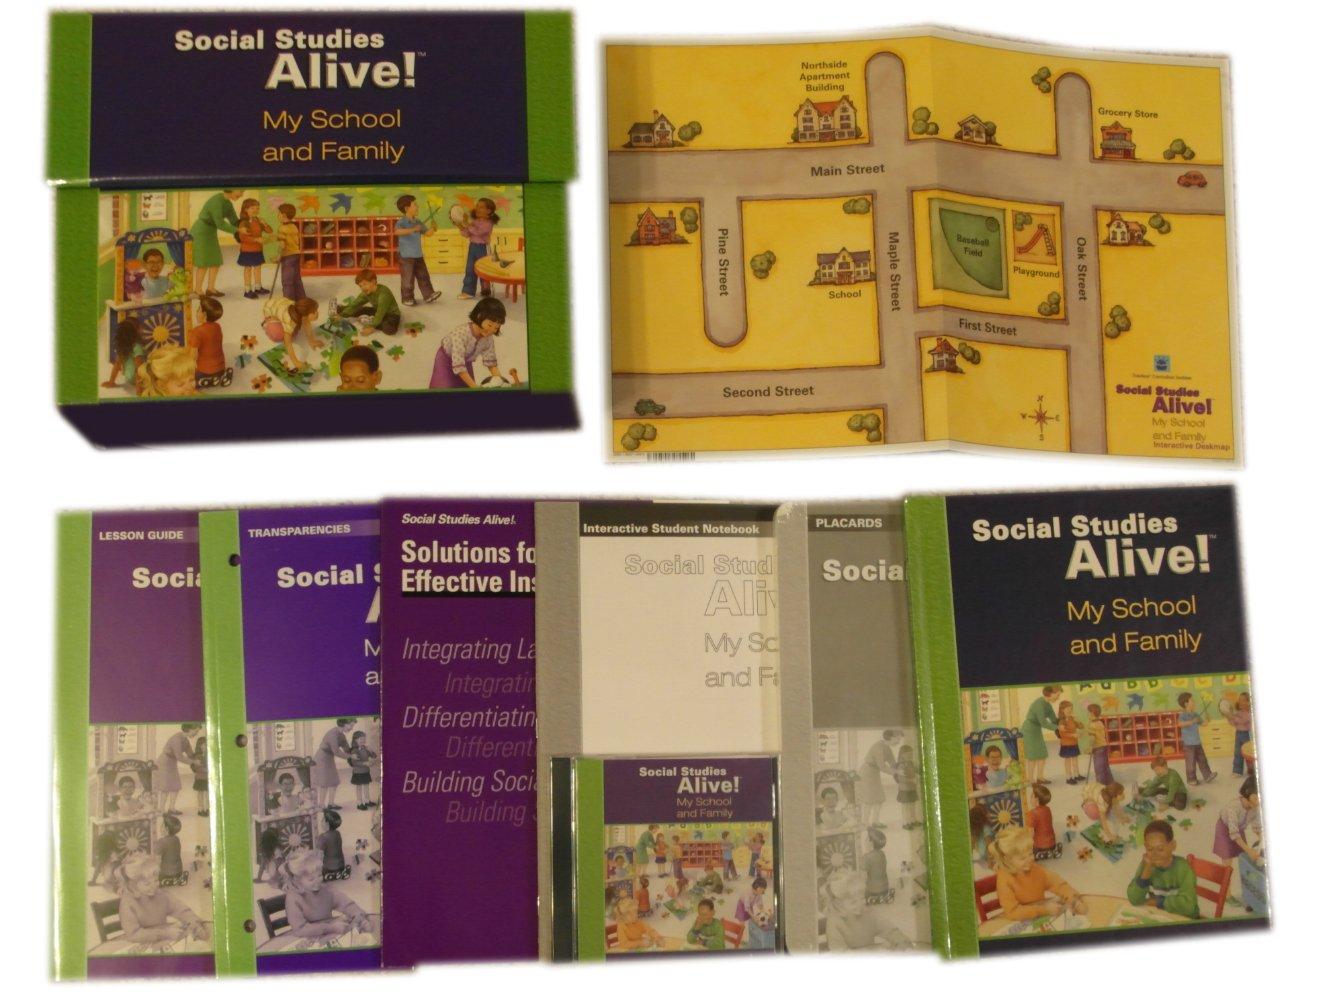 Read Online Social Studies Alive! My School and Family Set PDF ePub fb2 book